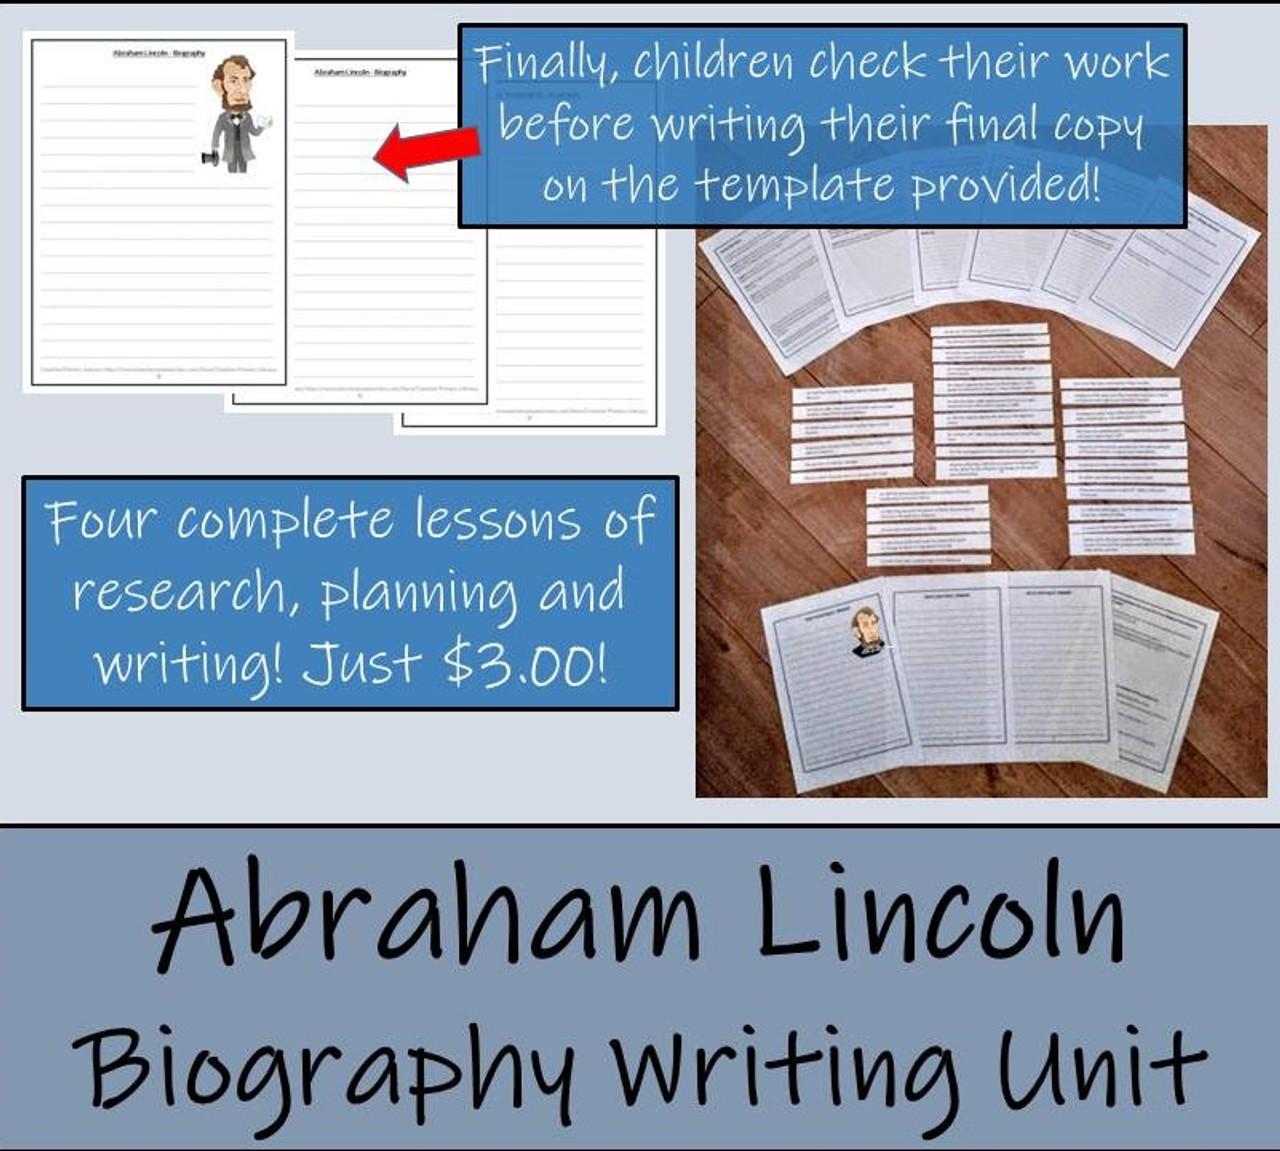 Abraham Lincoln - 5th & 6th Grade Biography Writing Activity